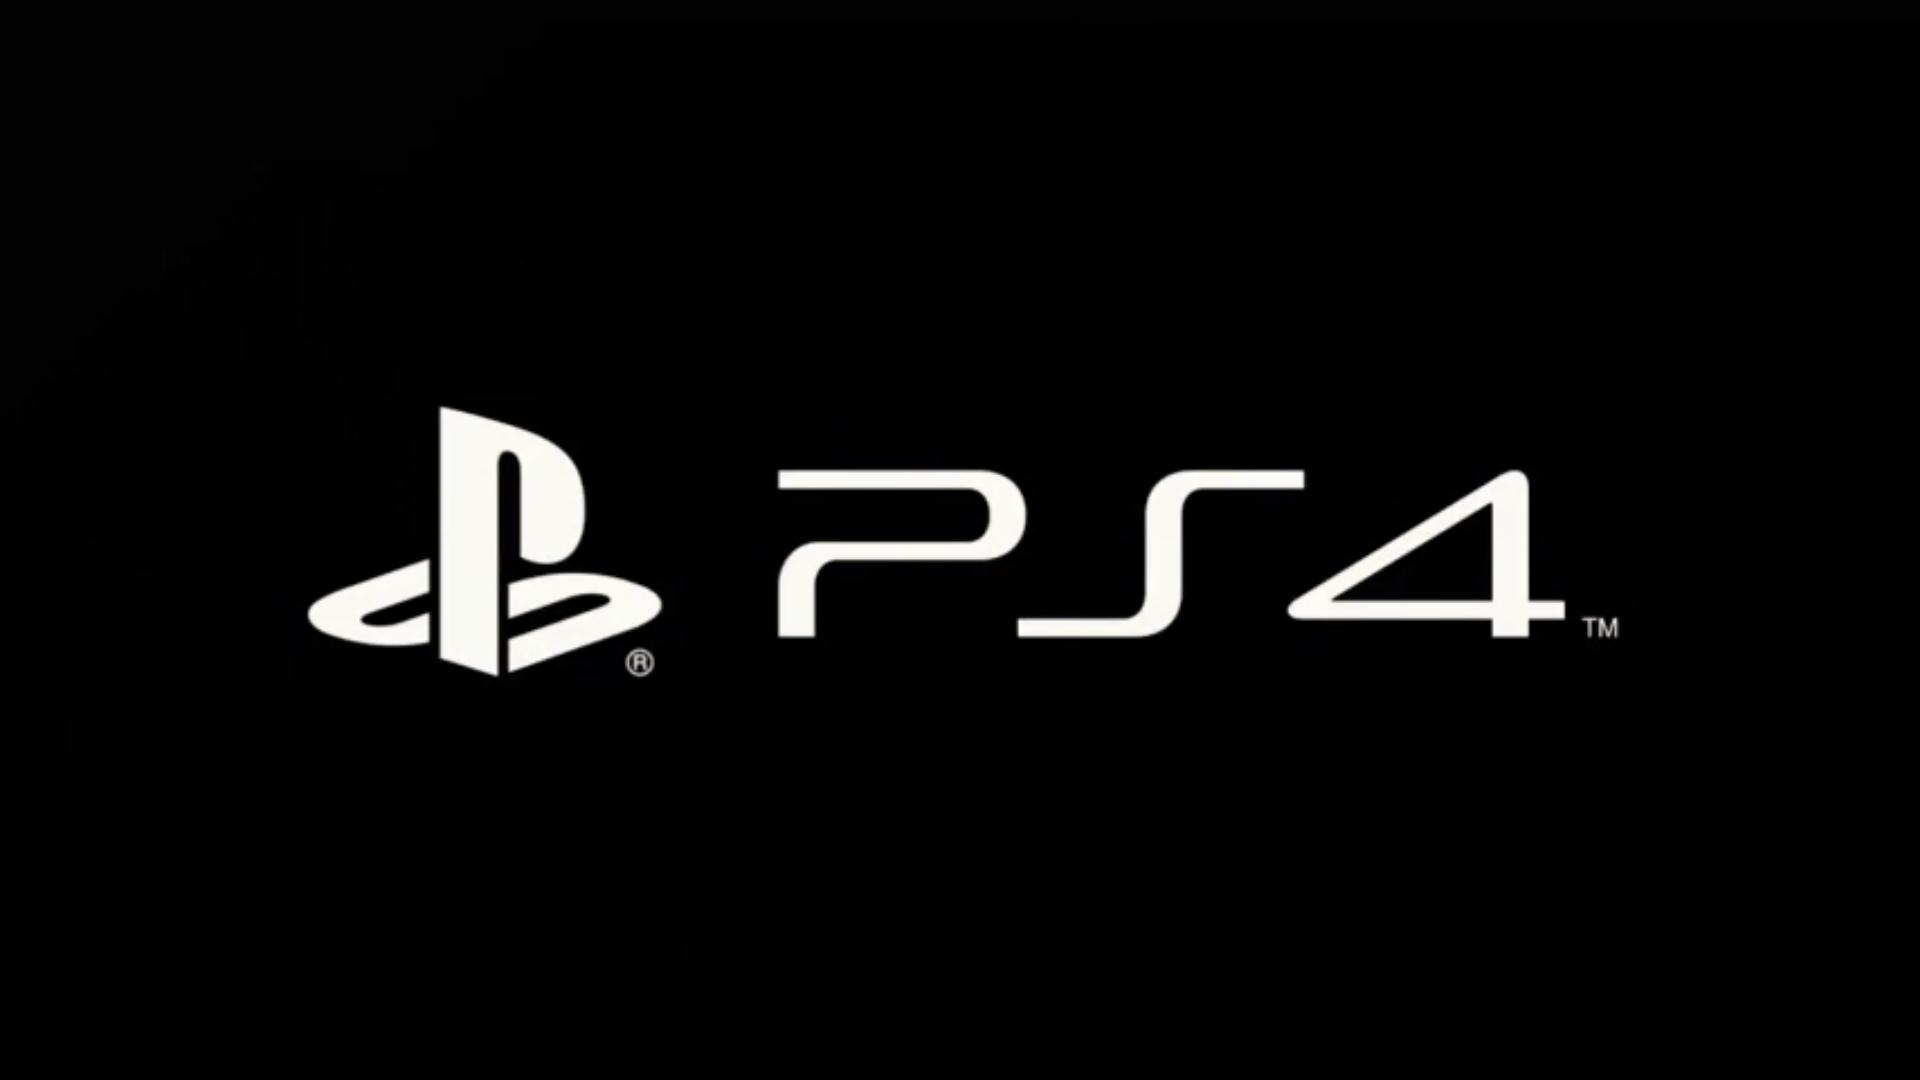 PS4 Logo Wallpaper